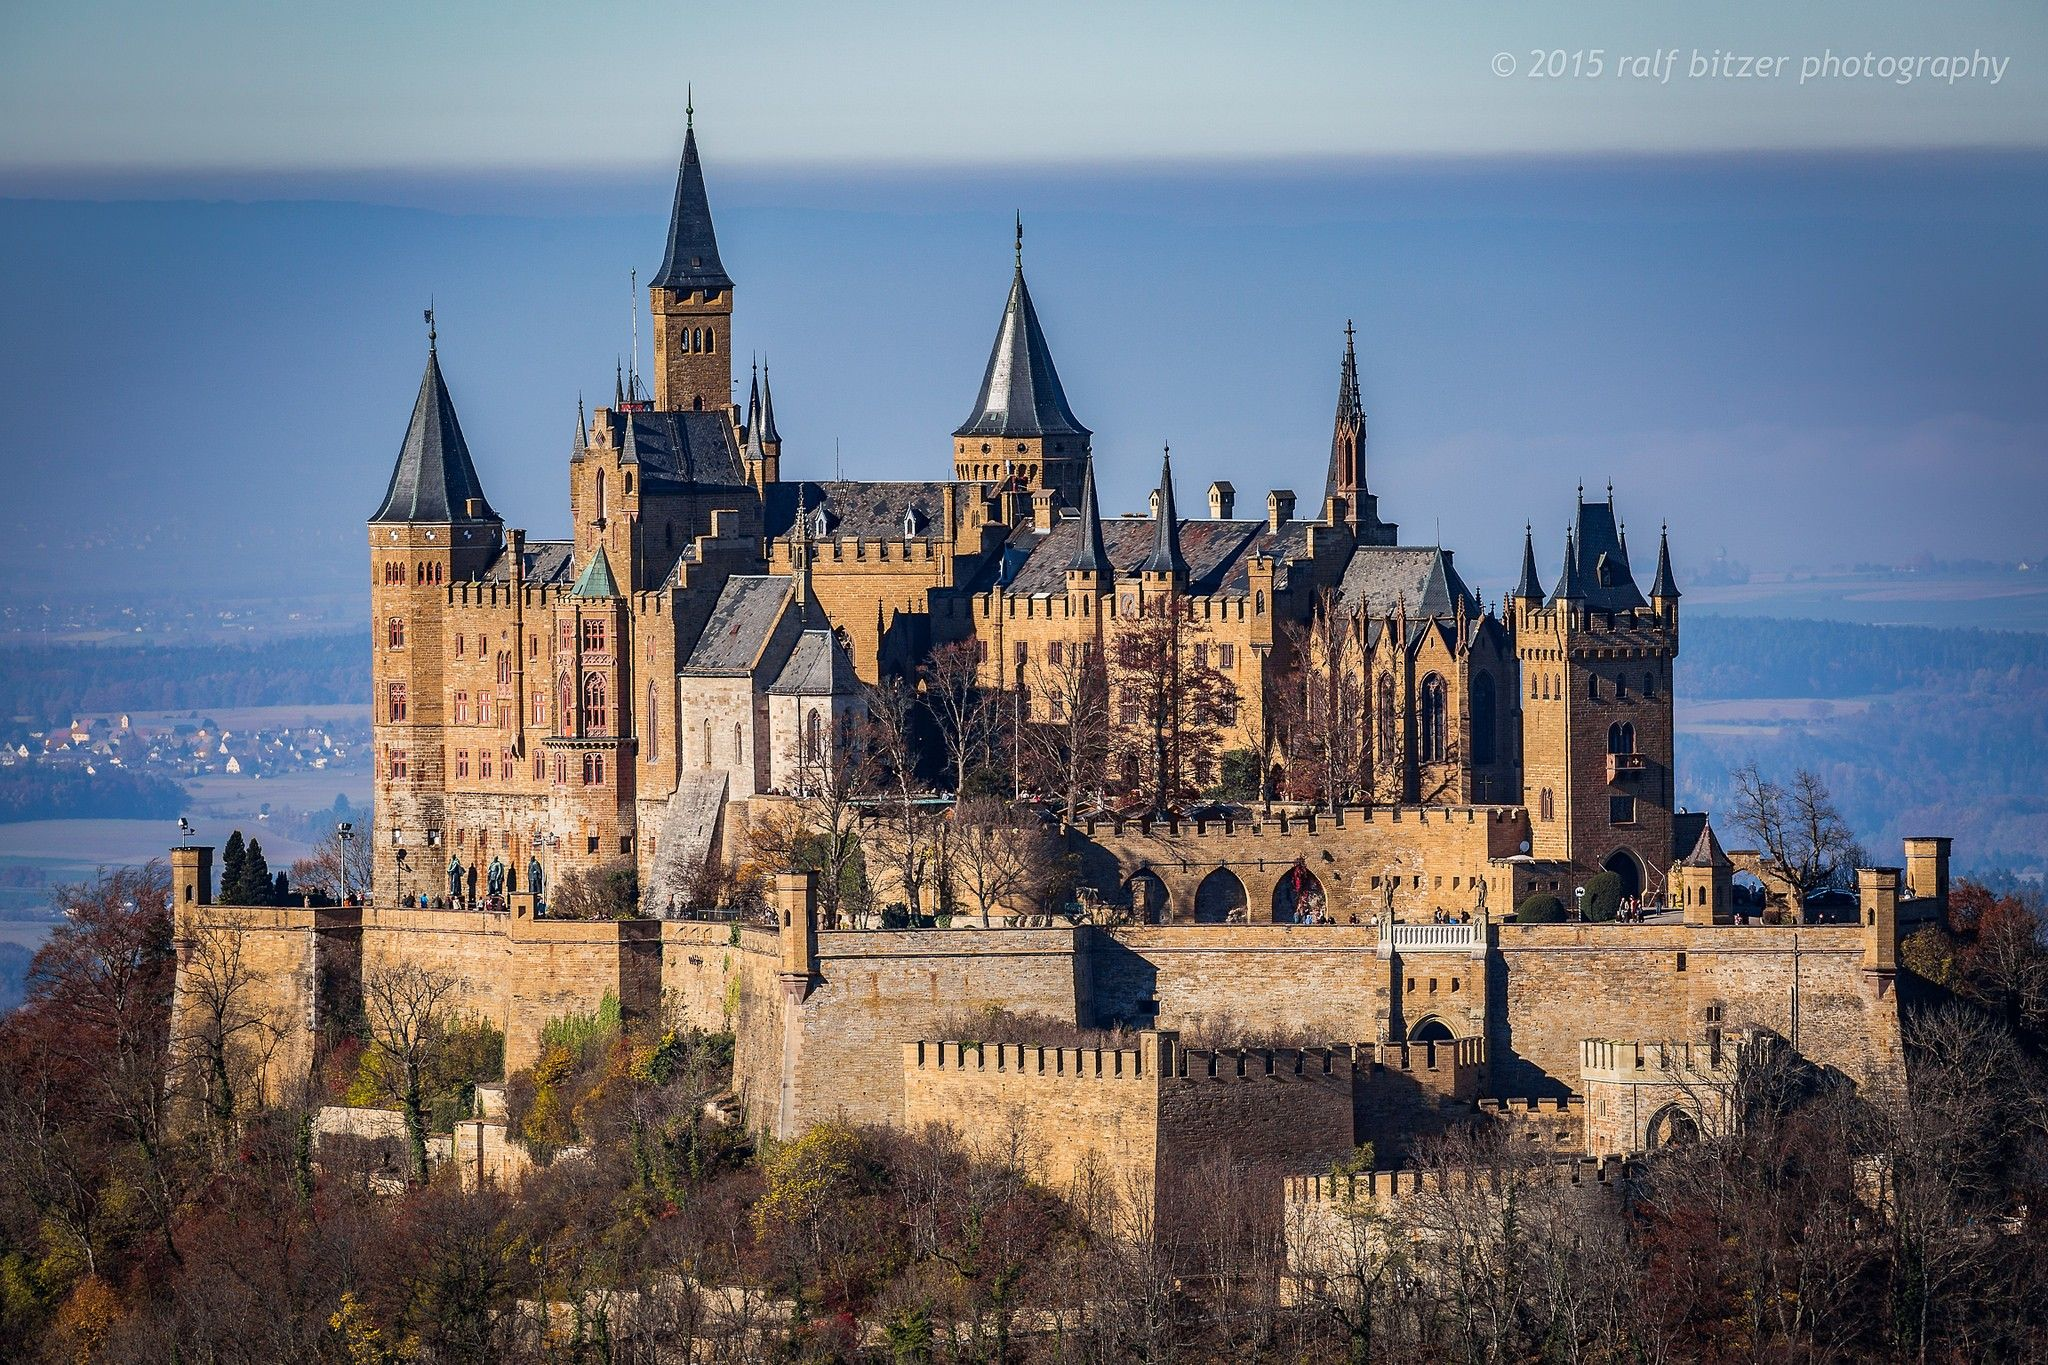 Hohenzollern Castle Burg Hohenzollern In Germany In 2020 Hohenzollern Castle Castle Cologne Cathedral